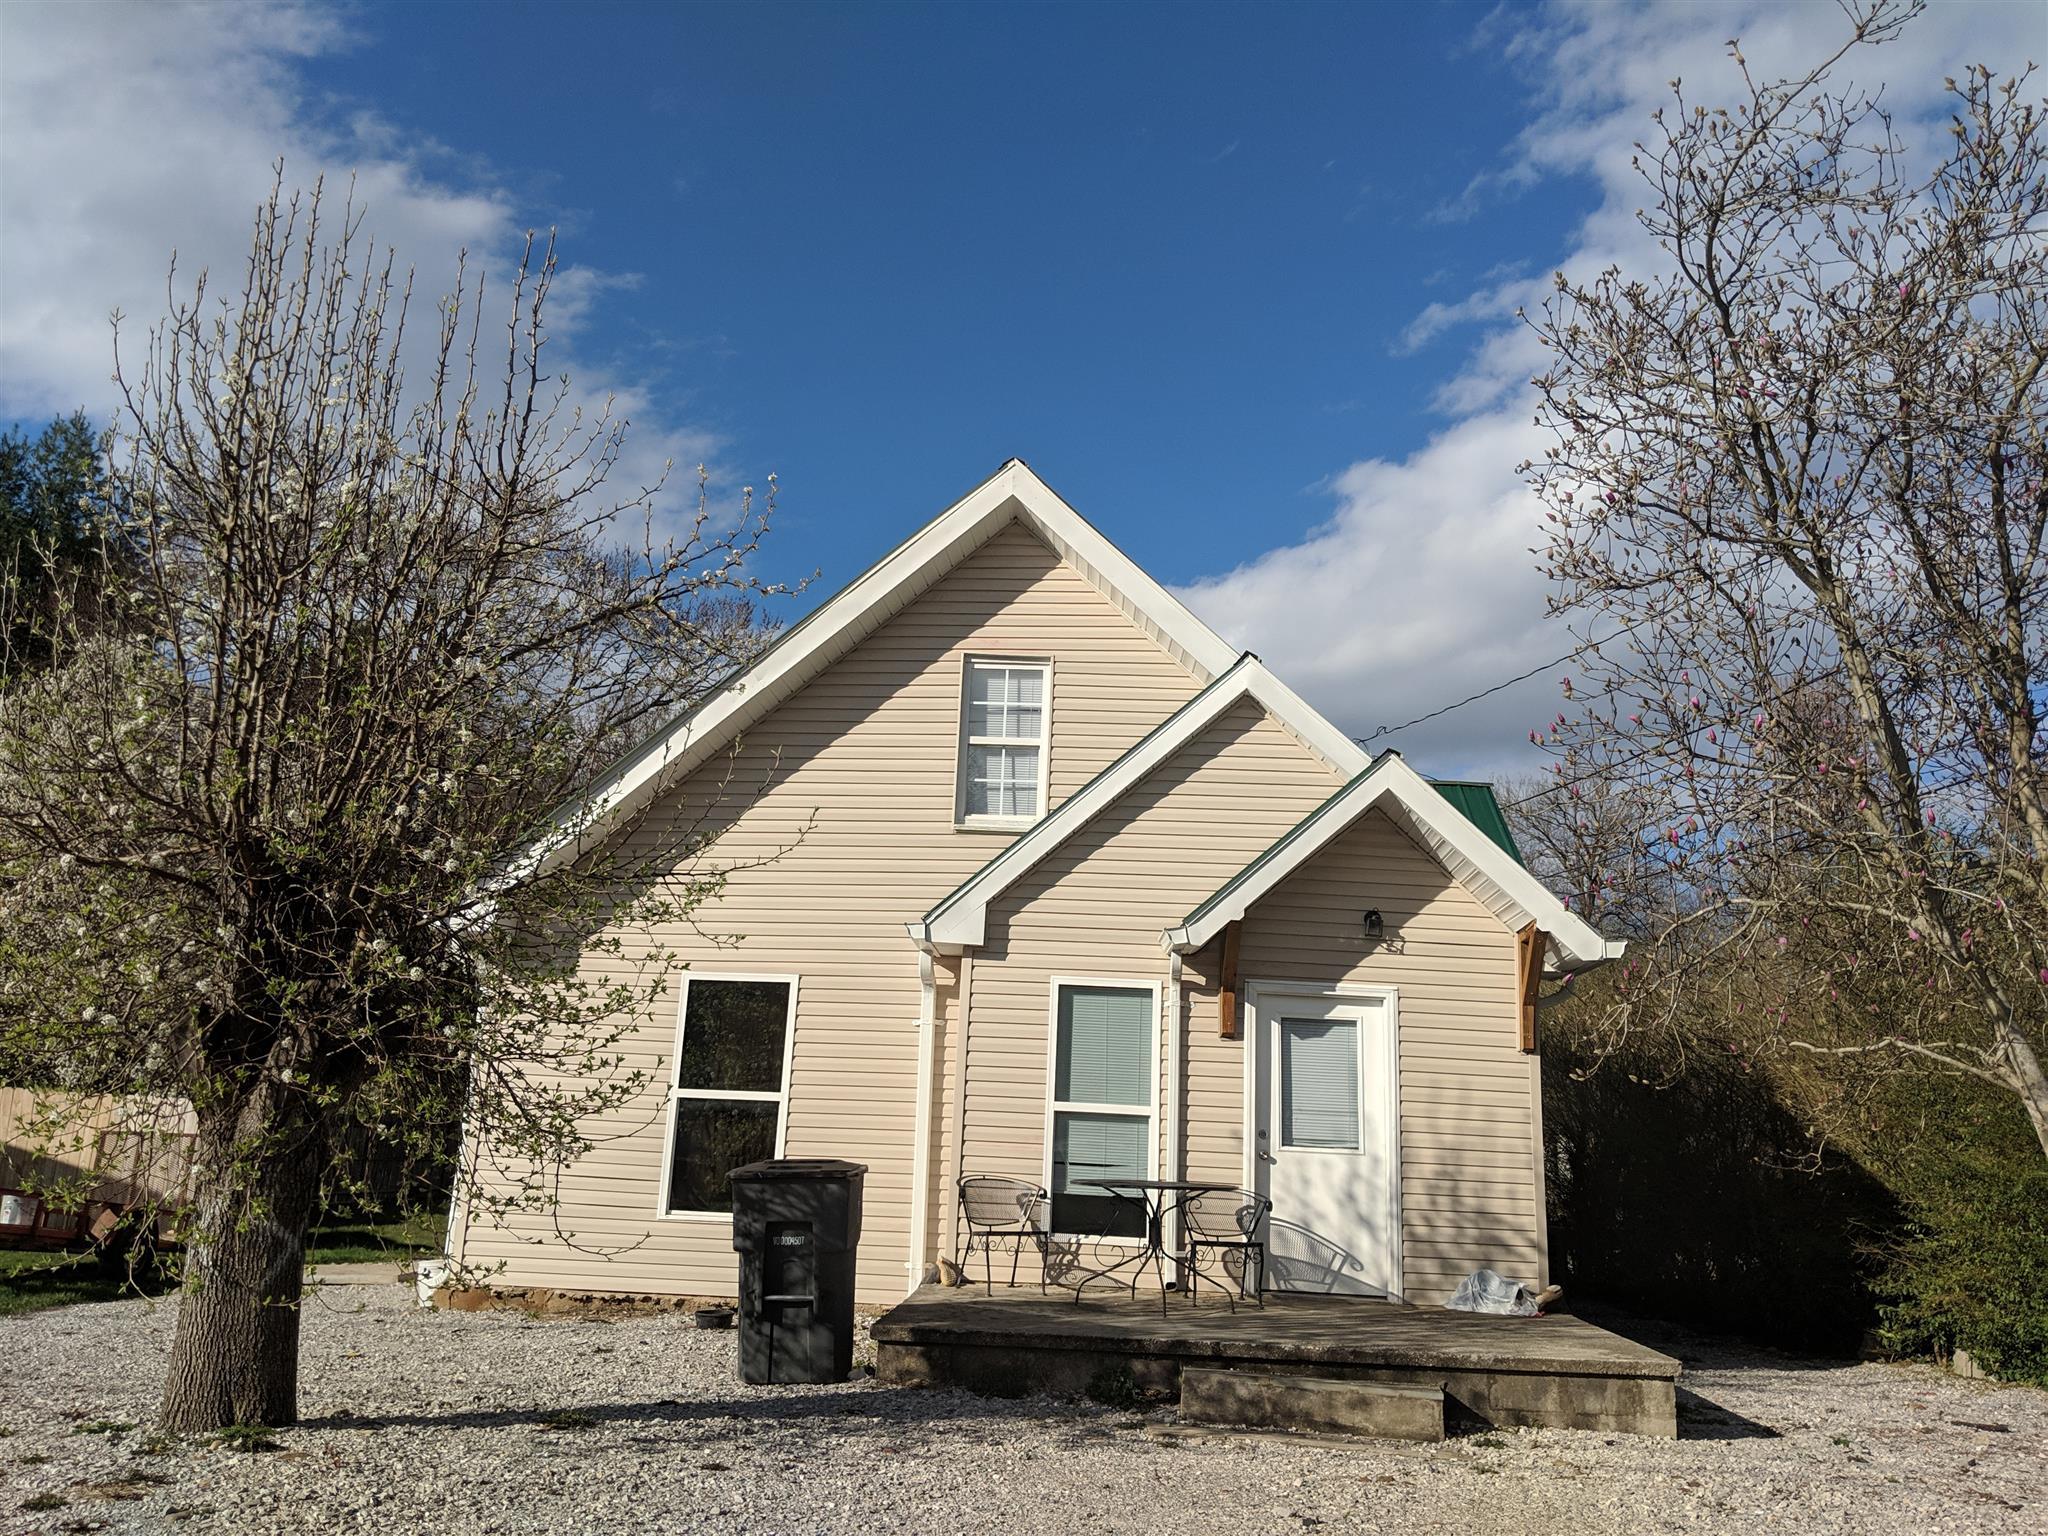 123 Warren St, McMinnville, TN 37110 - McMinnville, TN real estate listing